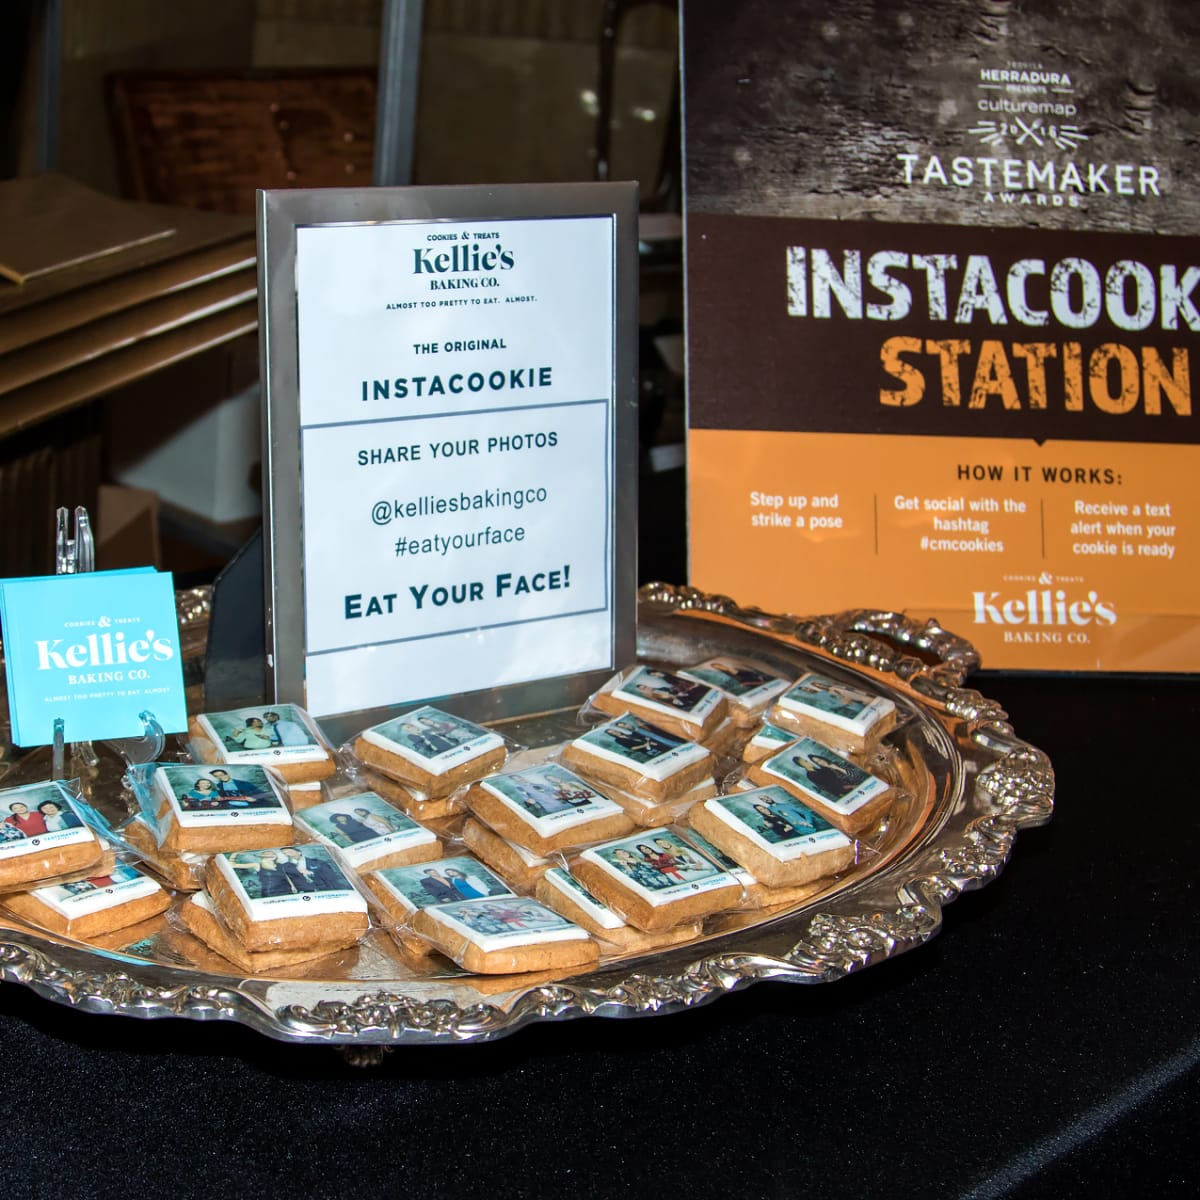 Kellie's Instacookie station